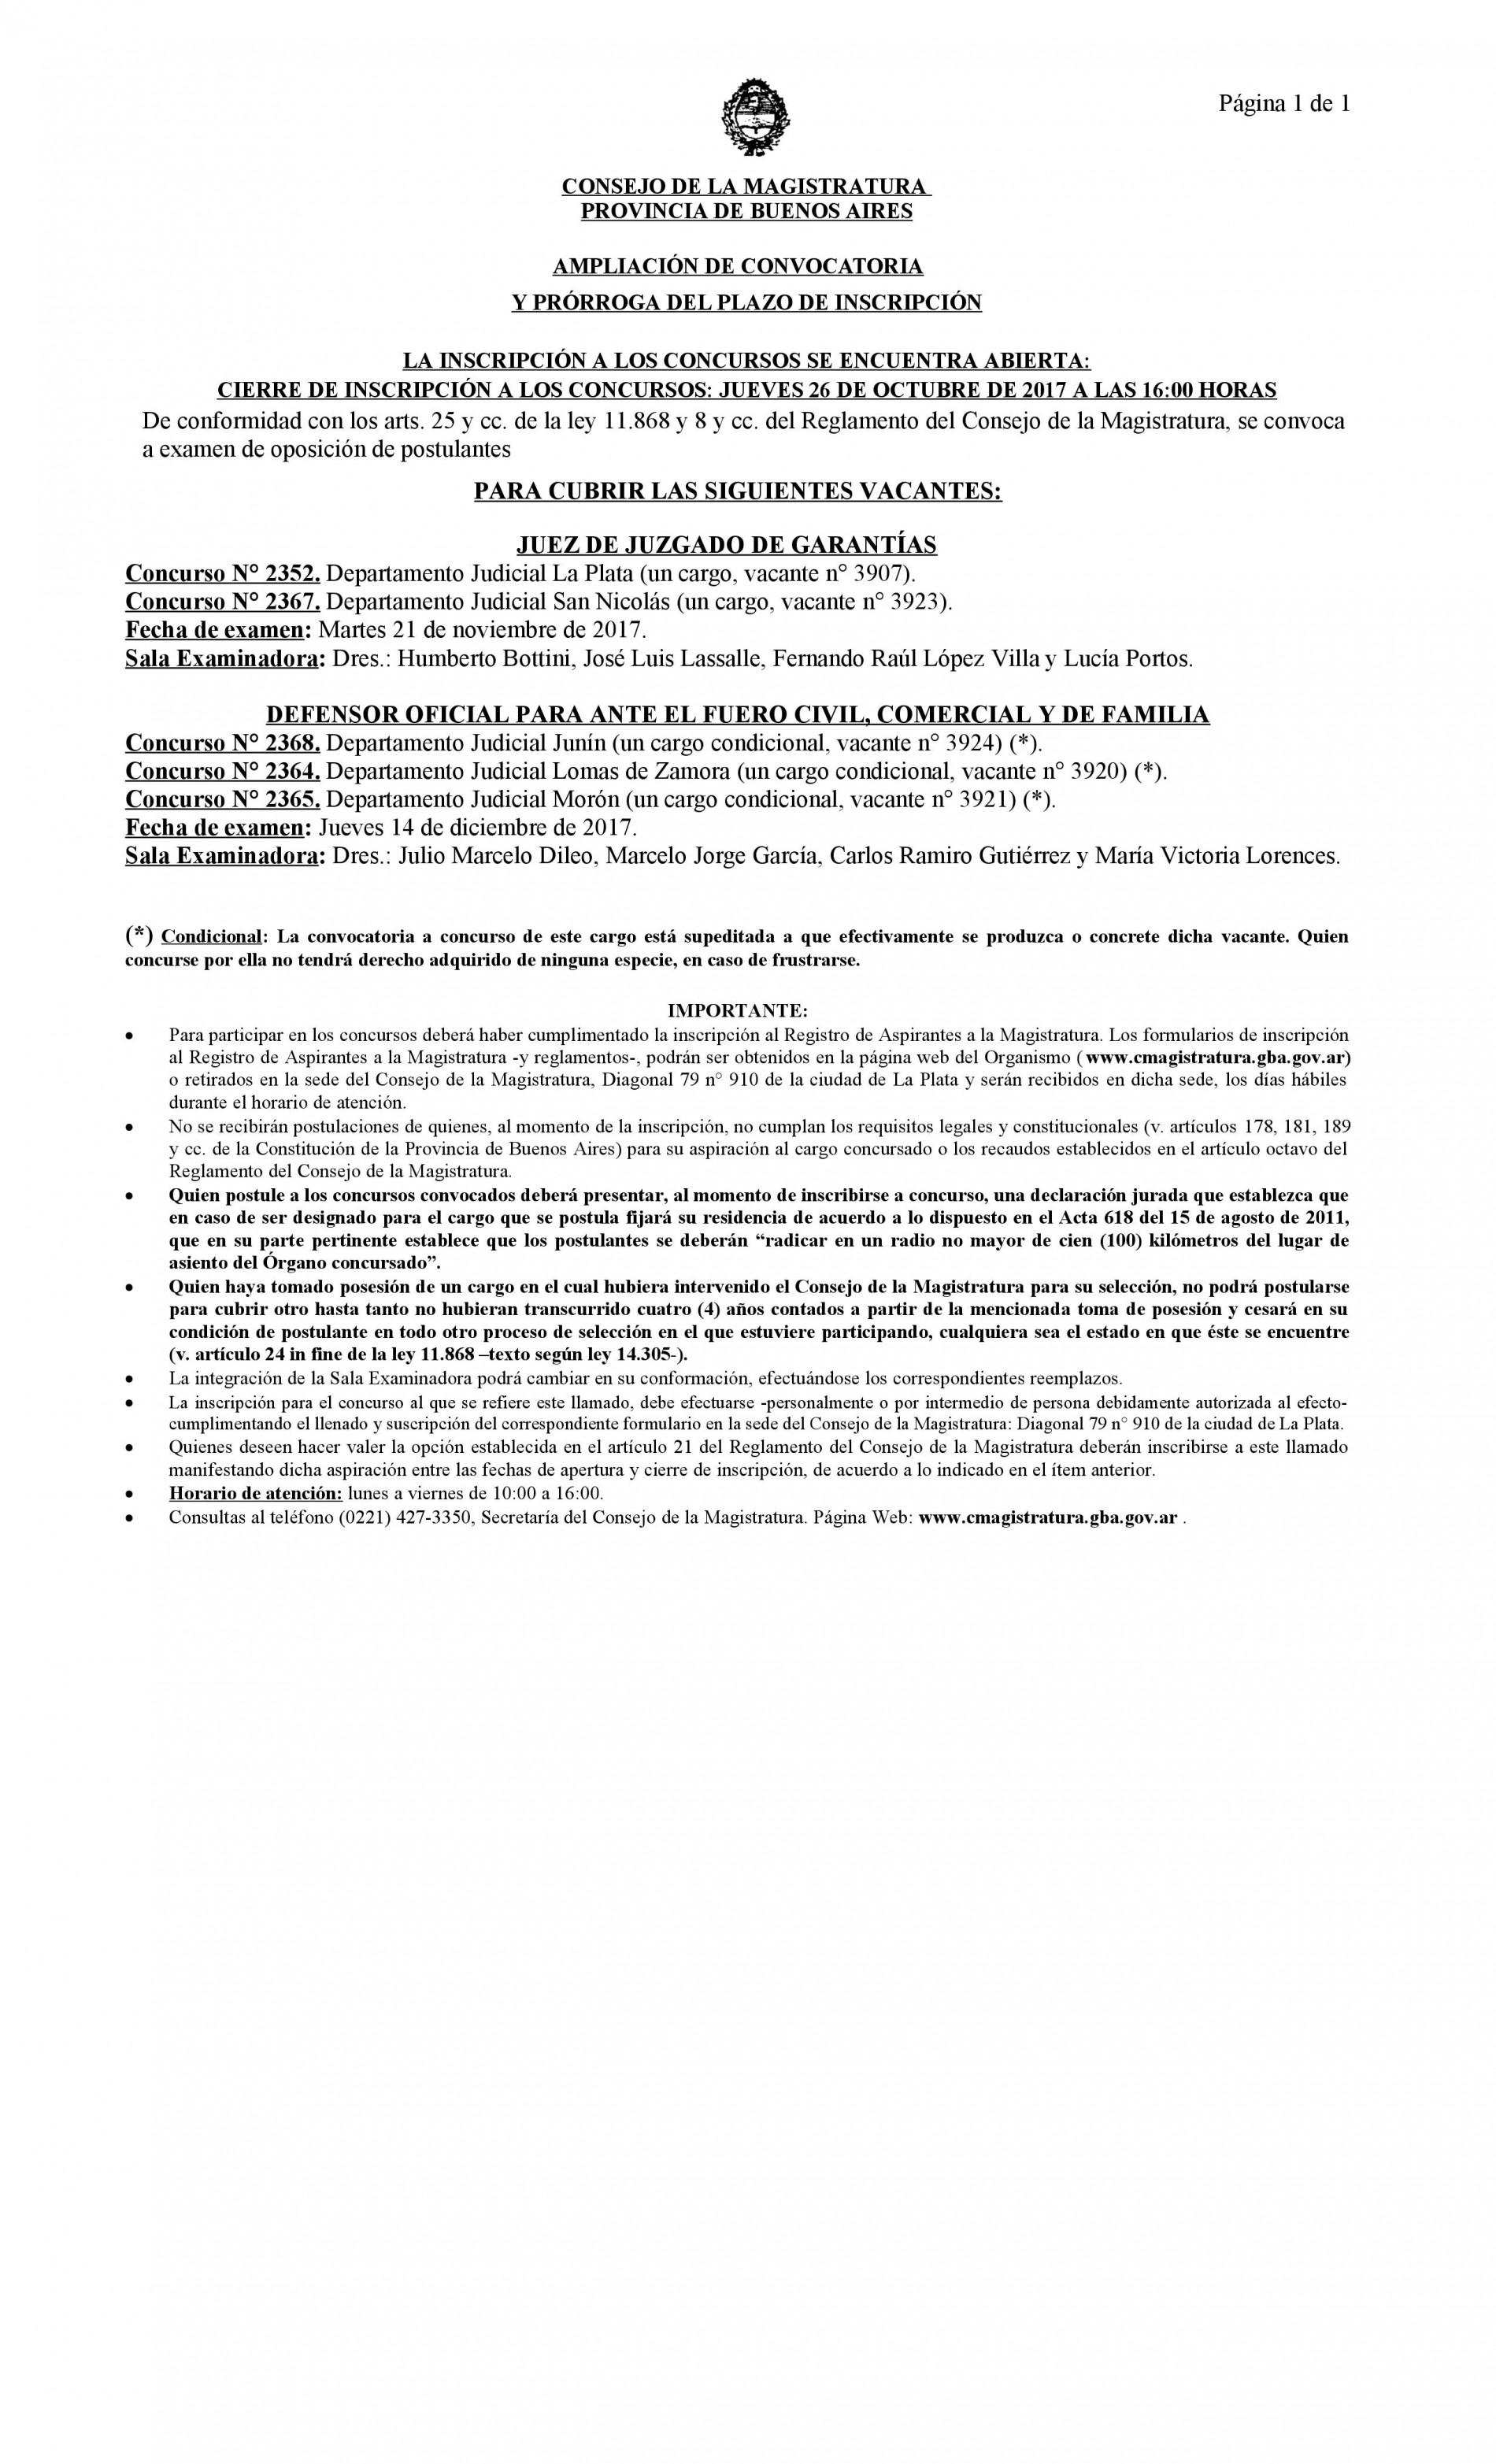 Ampliación de Convocatoria Consejo de la Magistratura Bonaerense